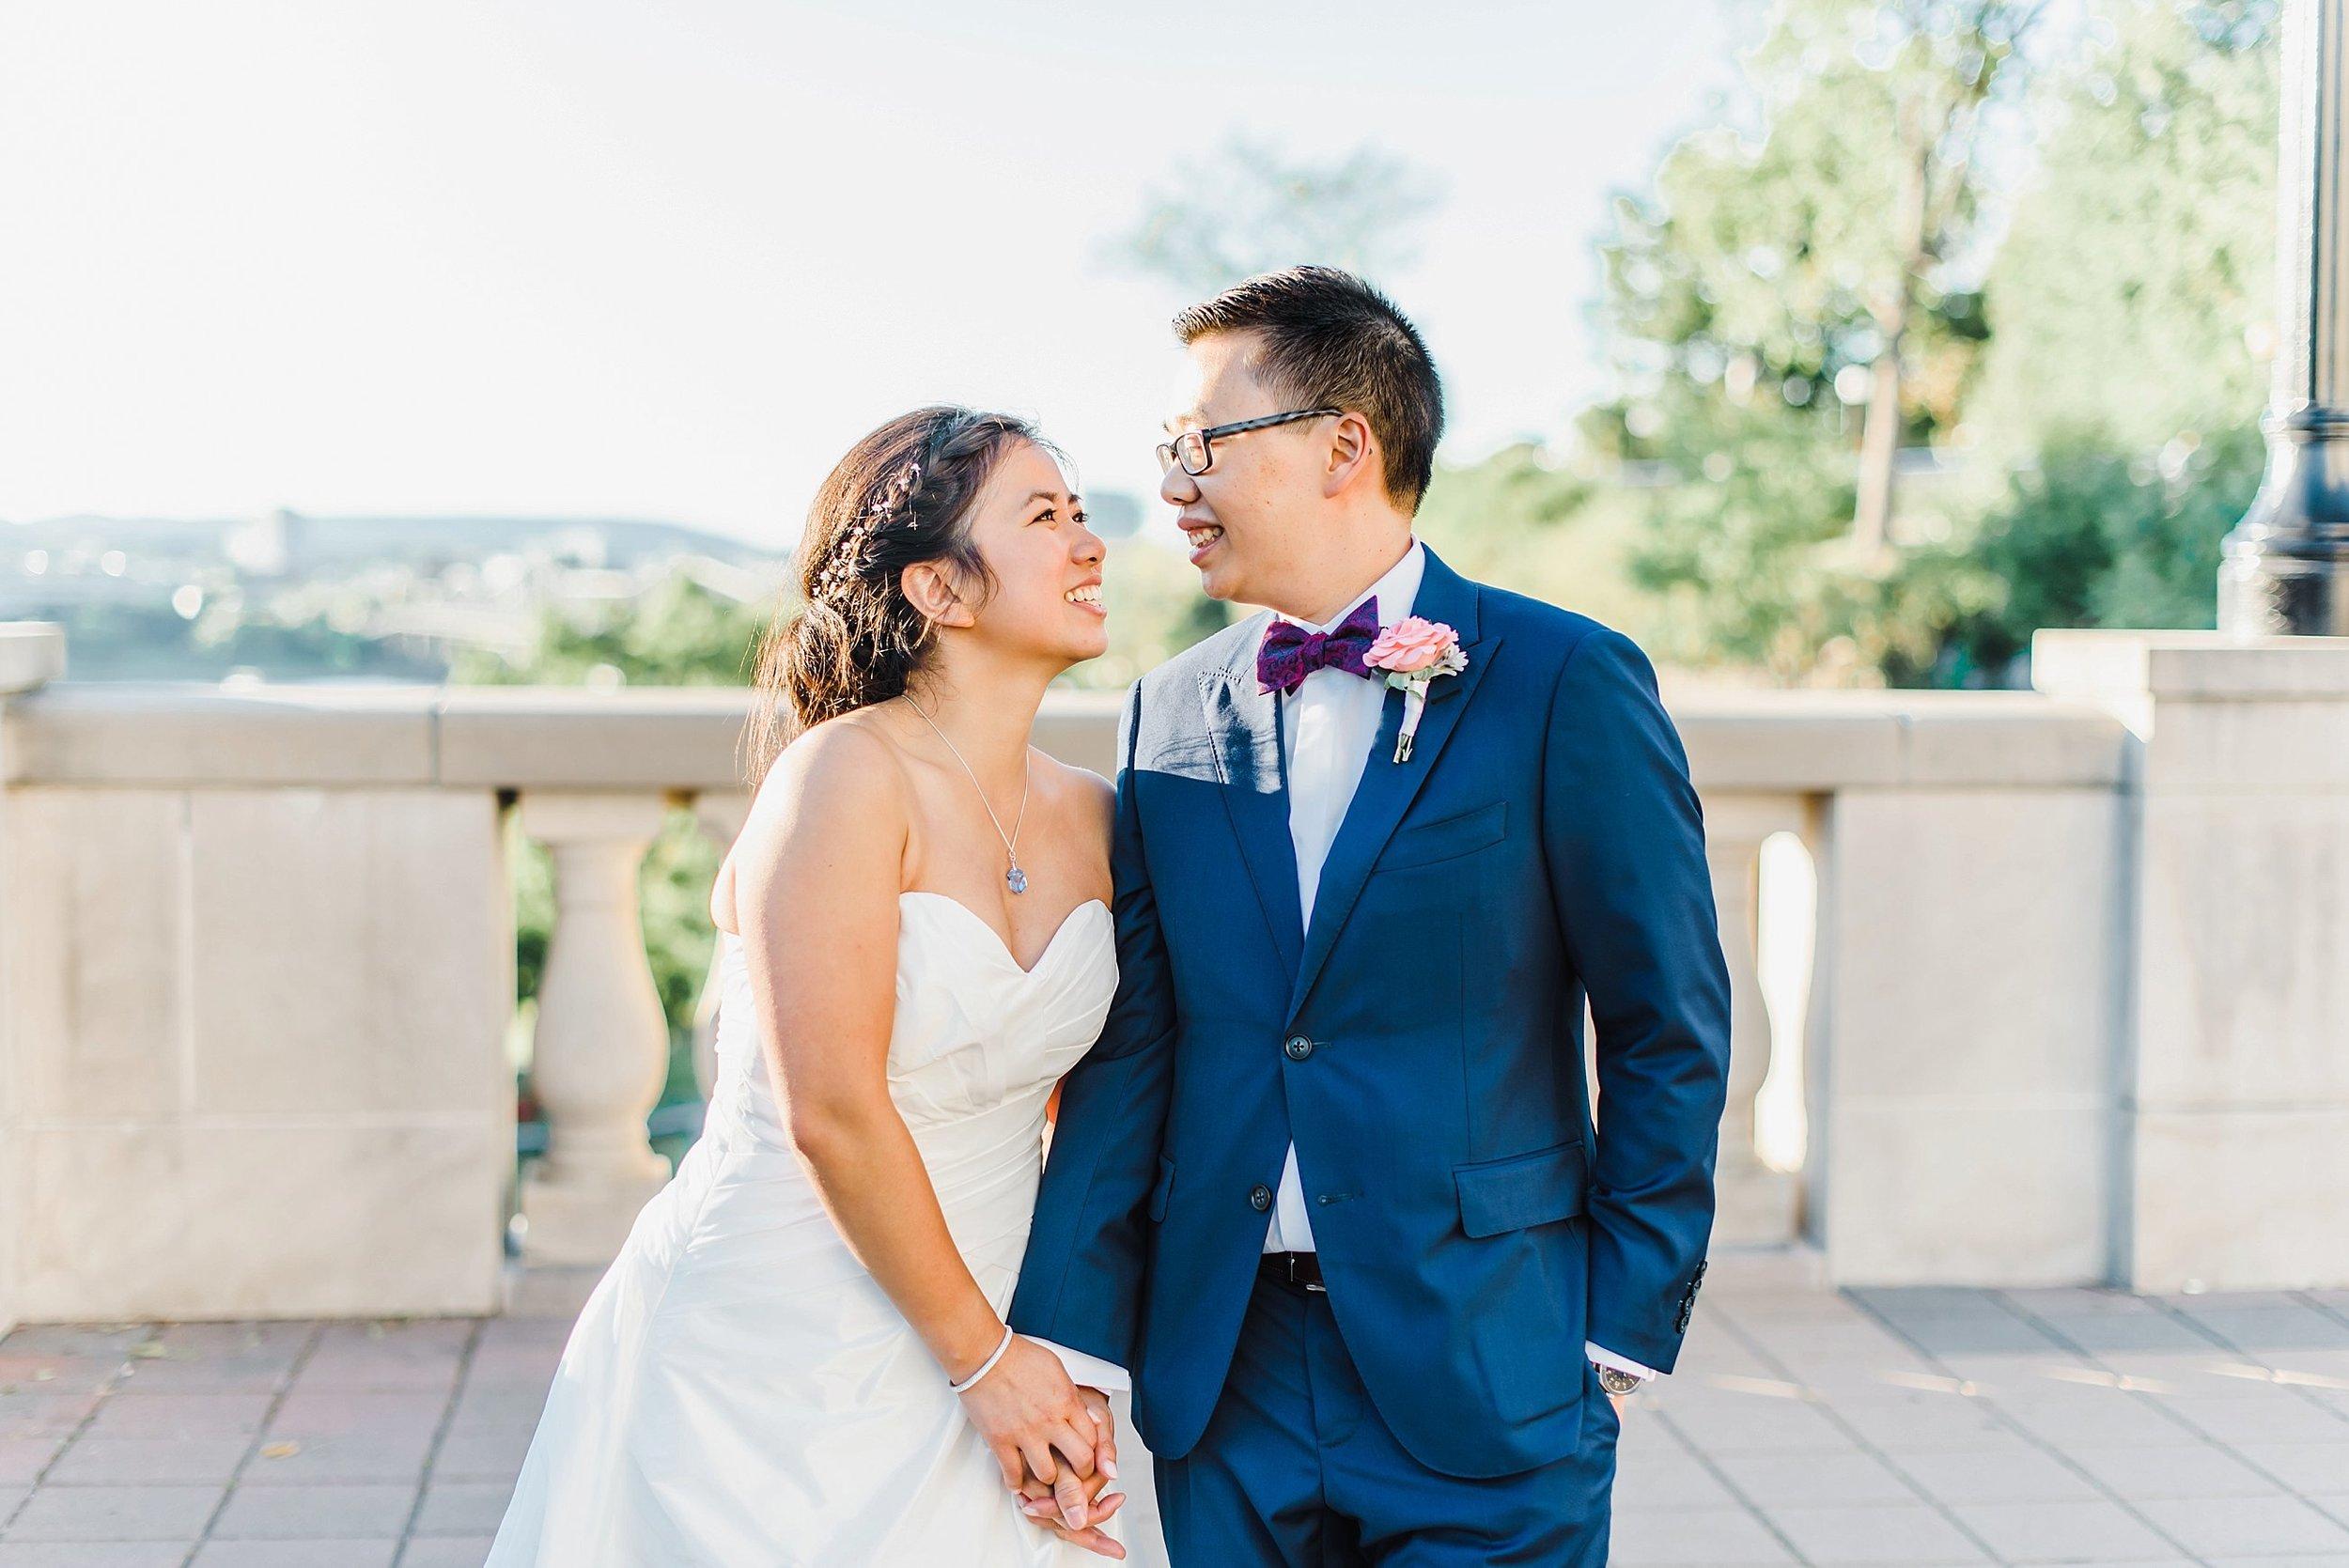 light airy indie fine art ottawa wedding photographer | Ali and Batoul Photography_1554.jpg